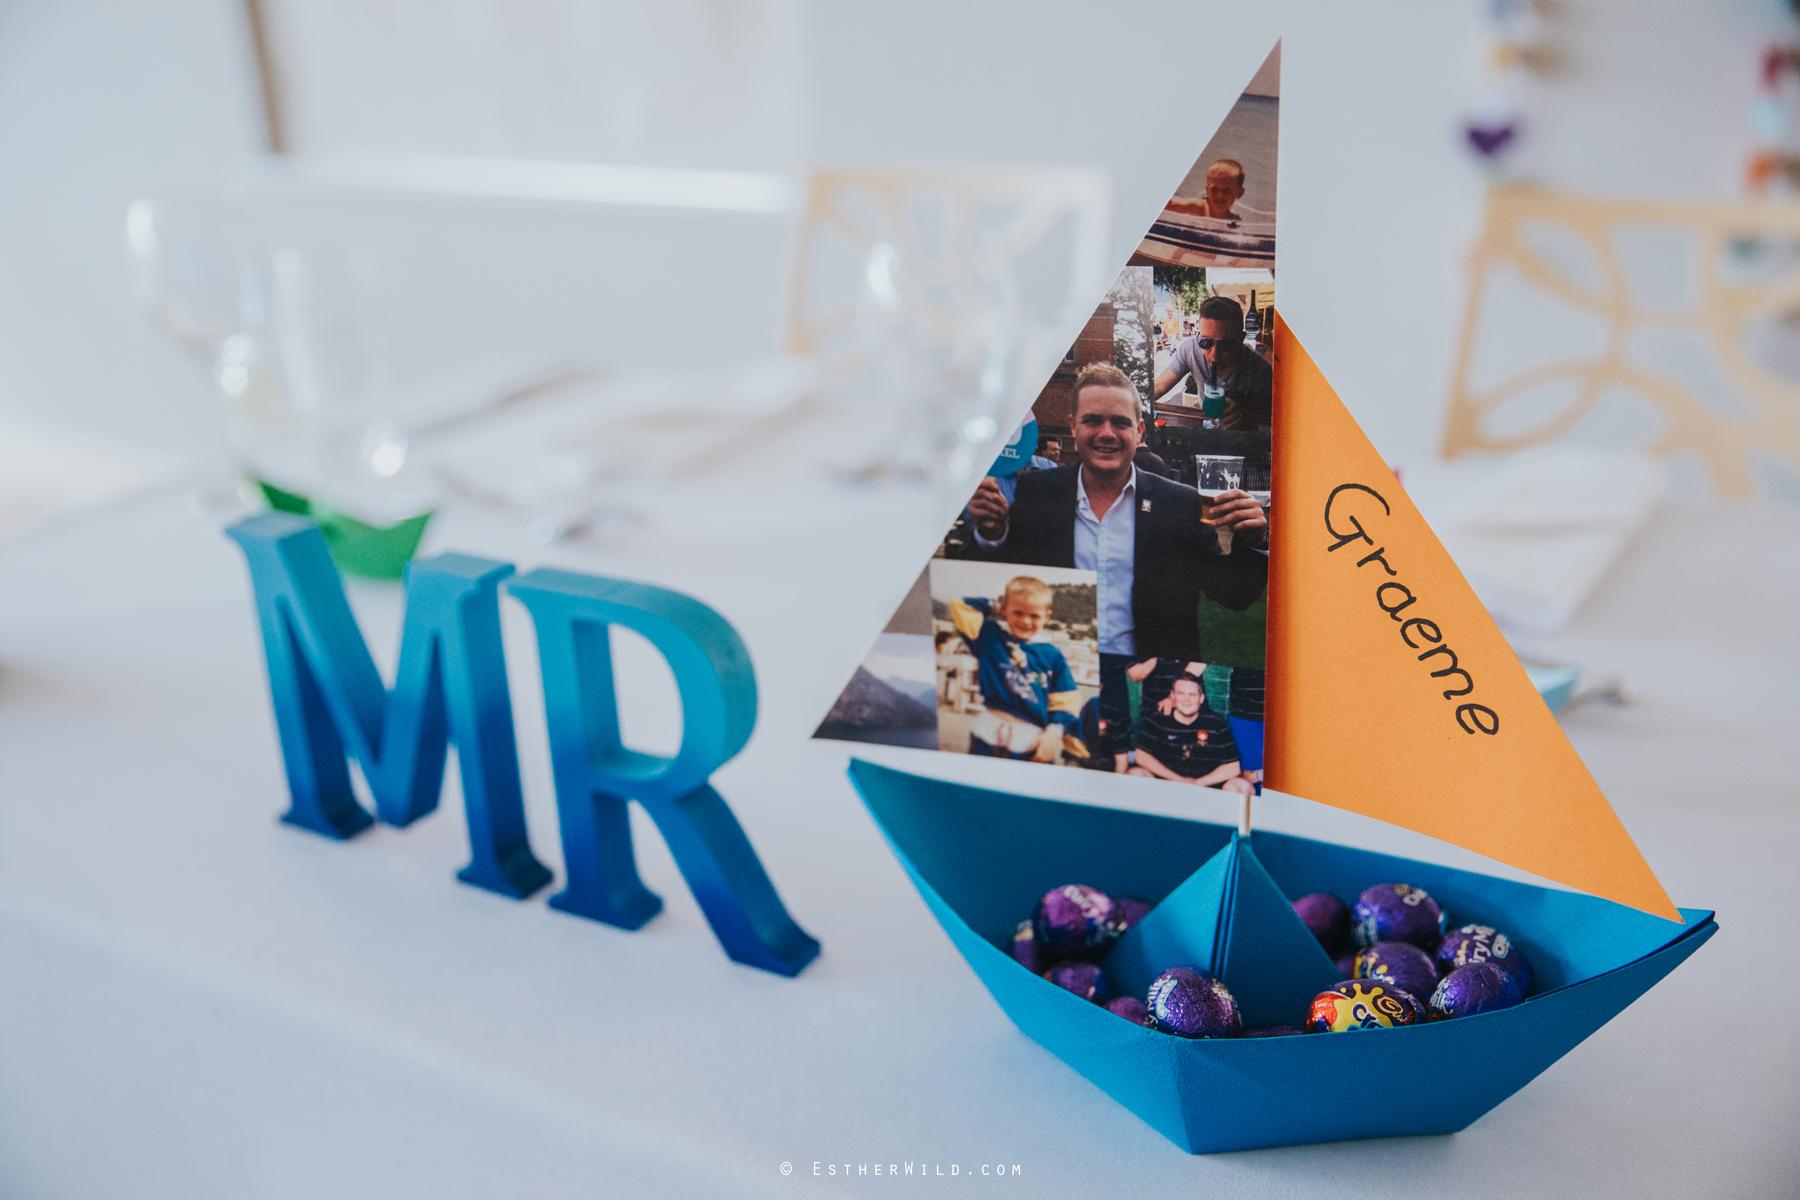 The_BoatHouse_Wedding_Venue_Ormesby_Norfolk_Broads_Boat_Wedding_Photography_Esther_Wild_Photographer_IMG_0150.jpg